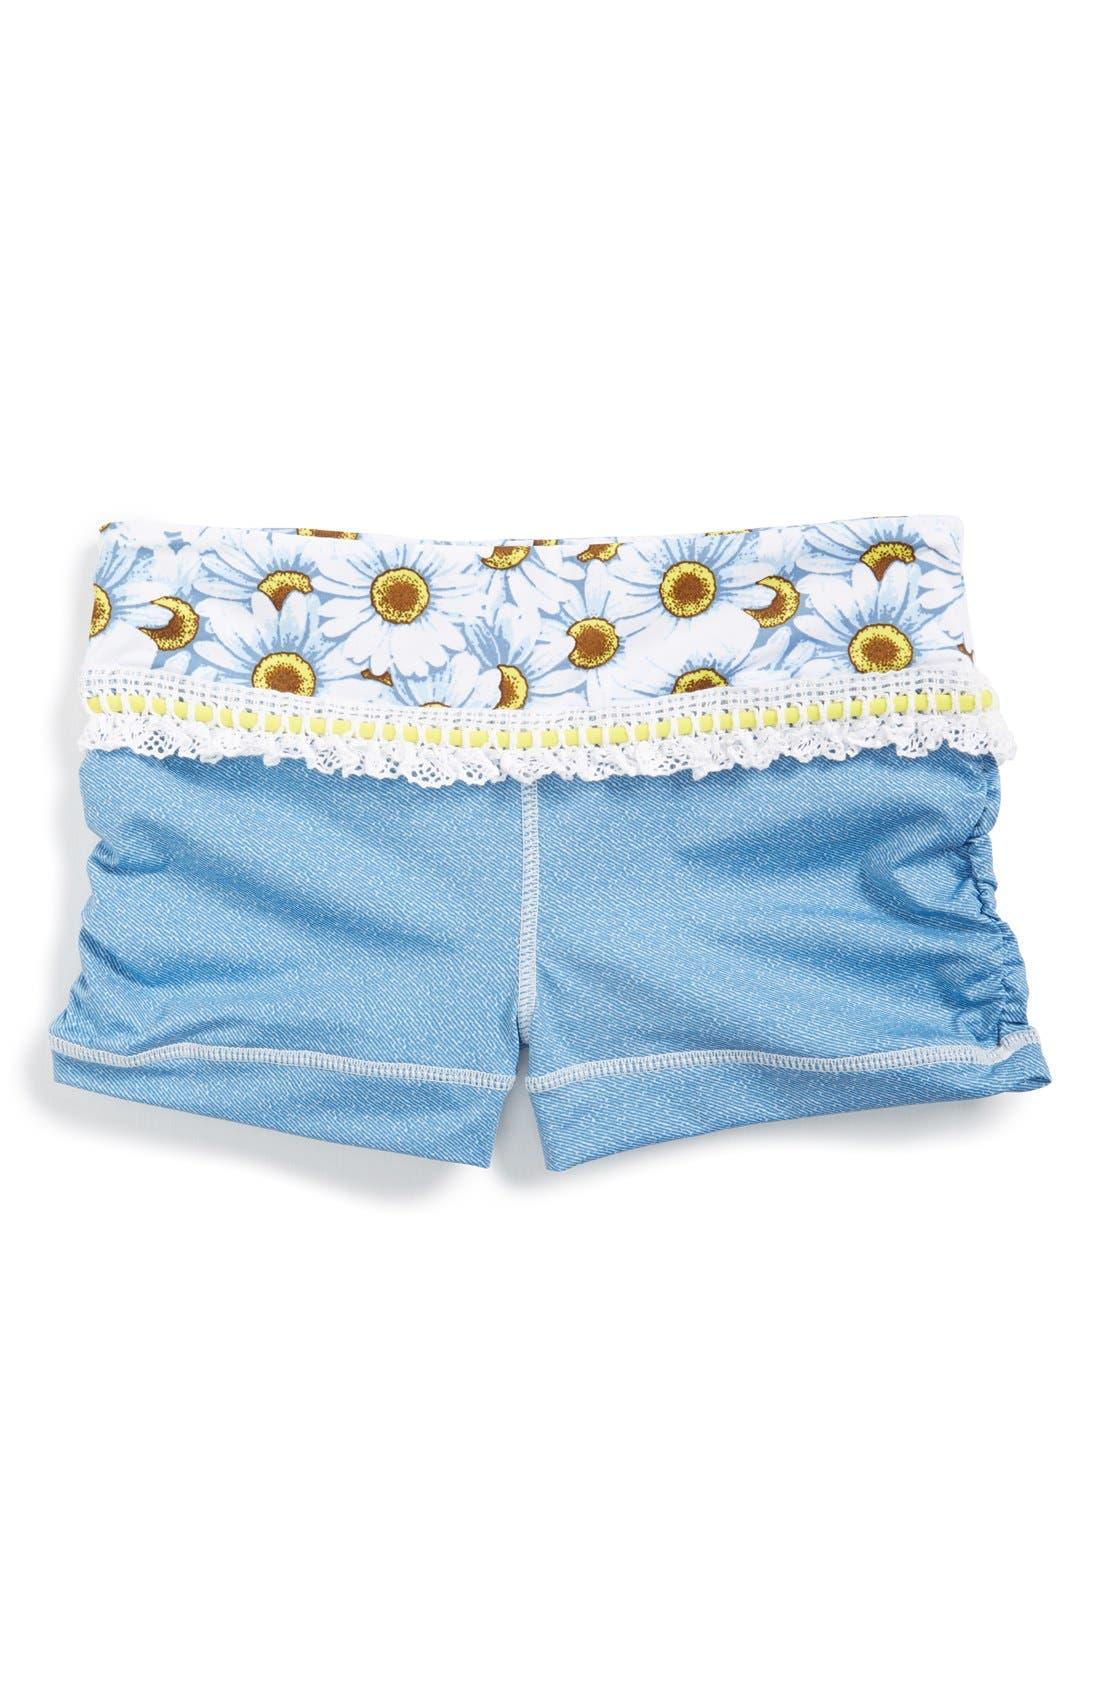 Alternate Image 1 Selected - California Kisses 'Wild Flower' Swim Shorts (Big Girls)